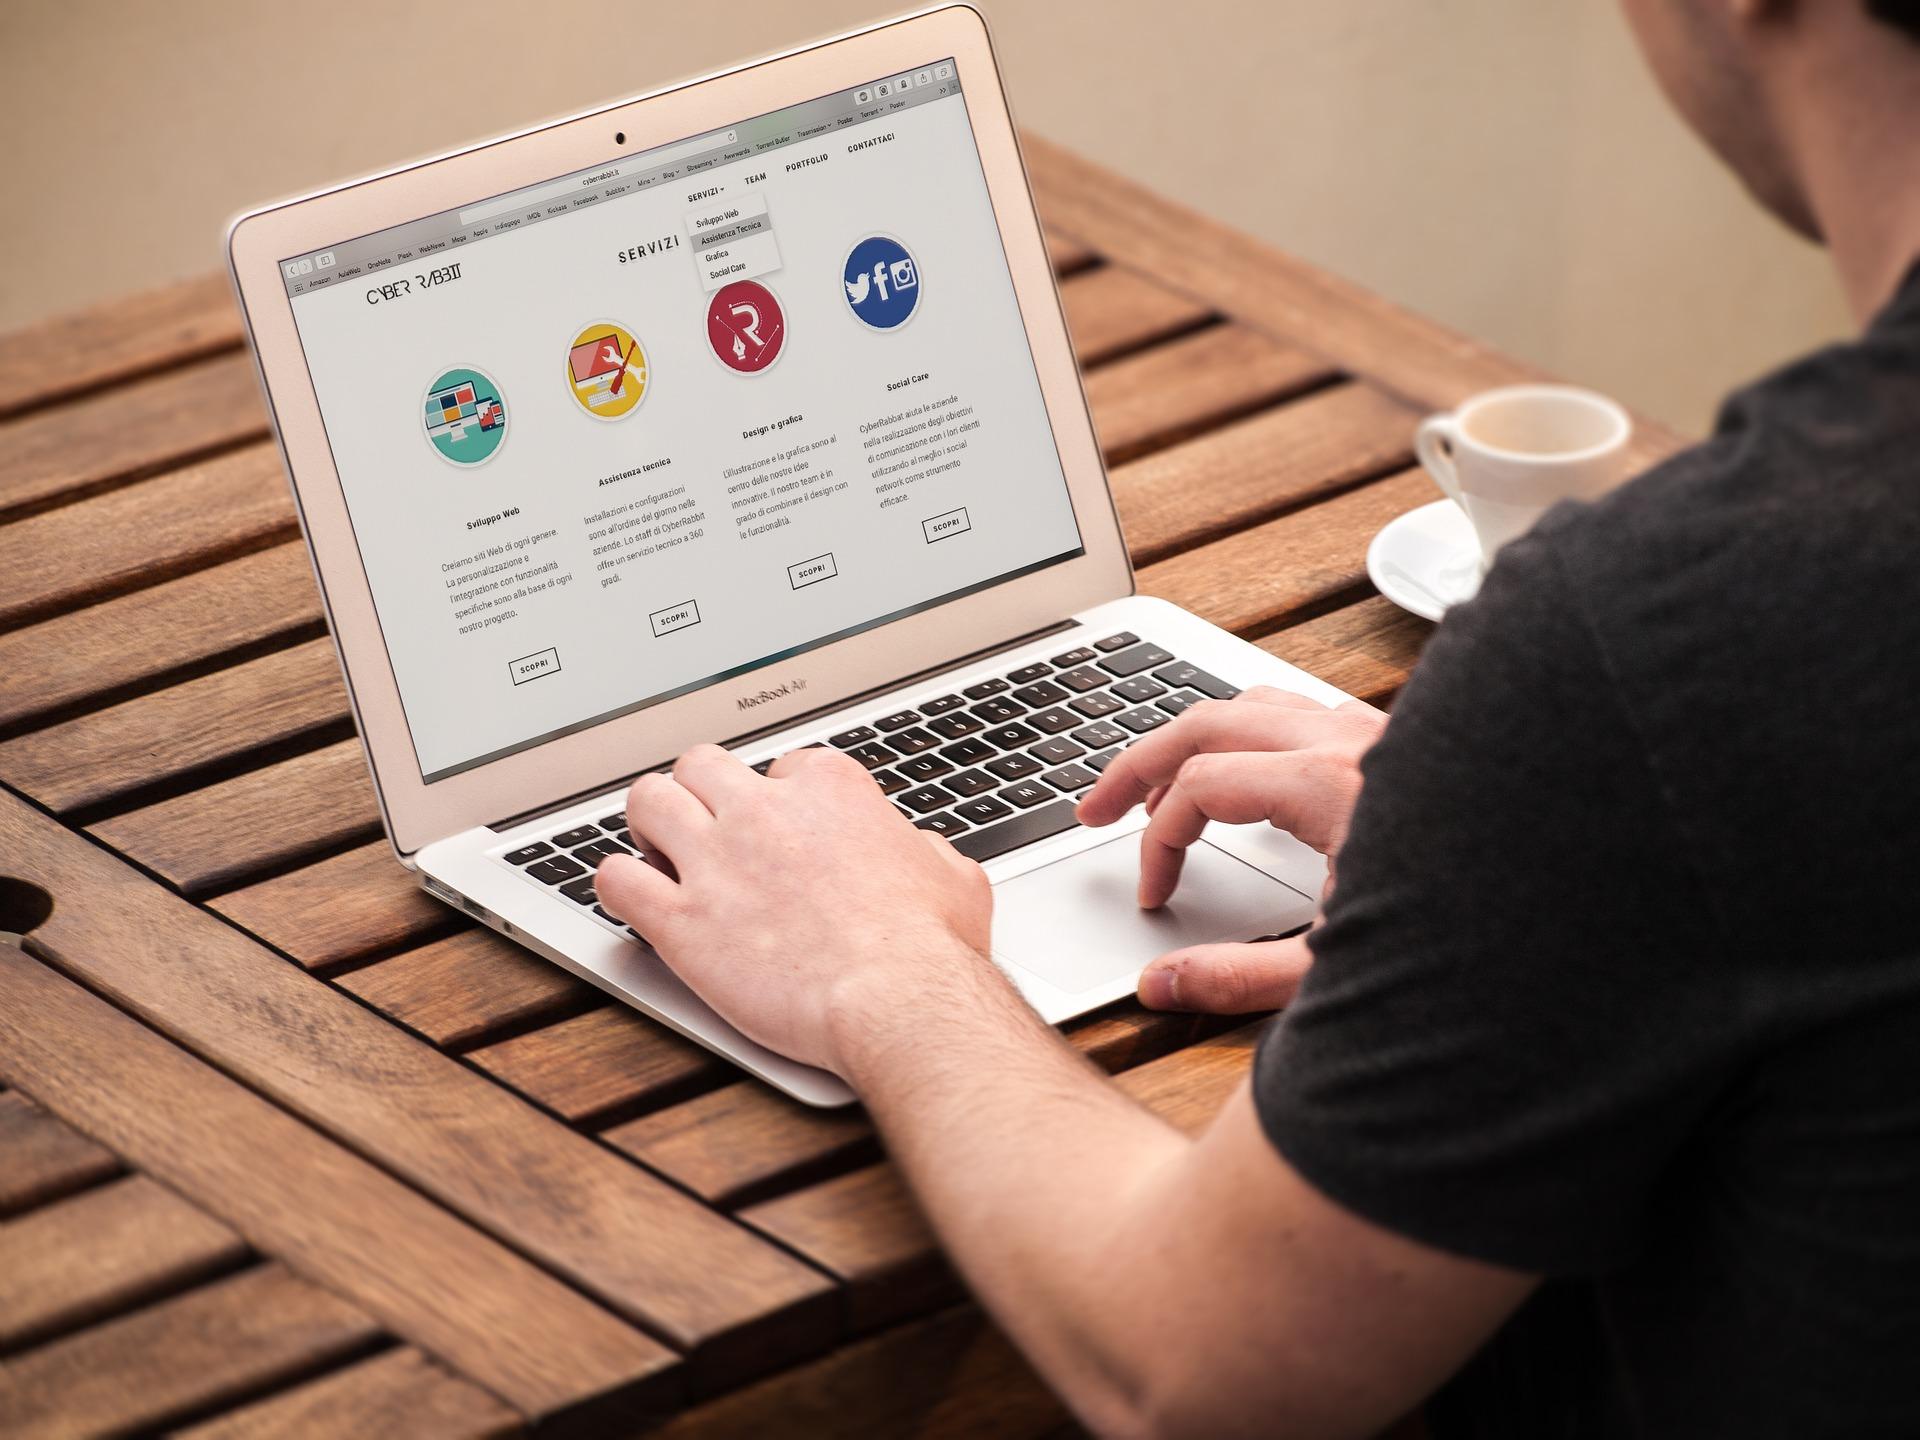 Ecommerce Web Design Inspiration for 2020